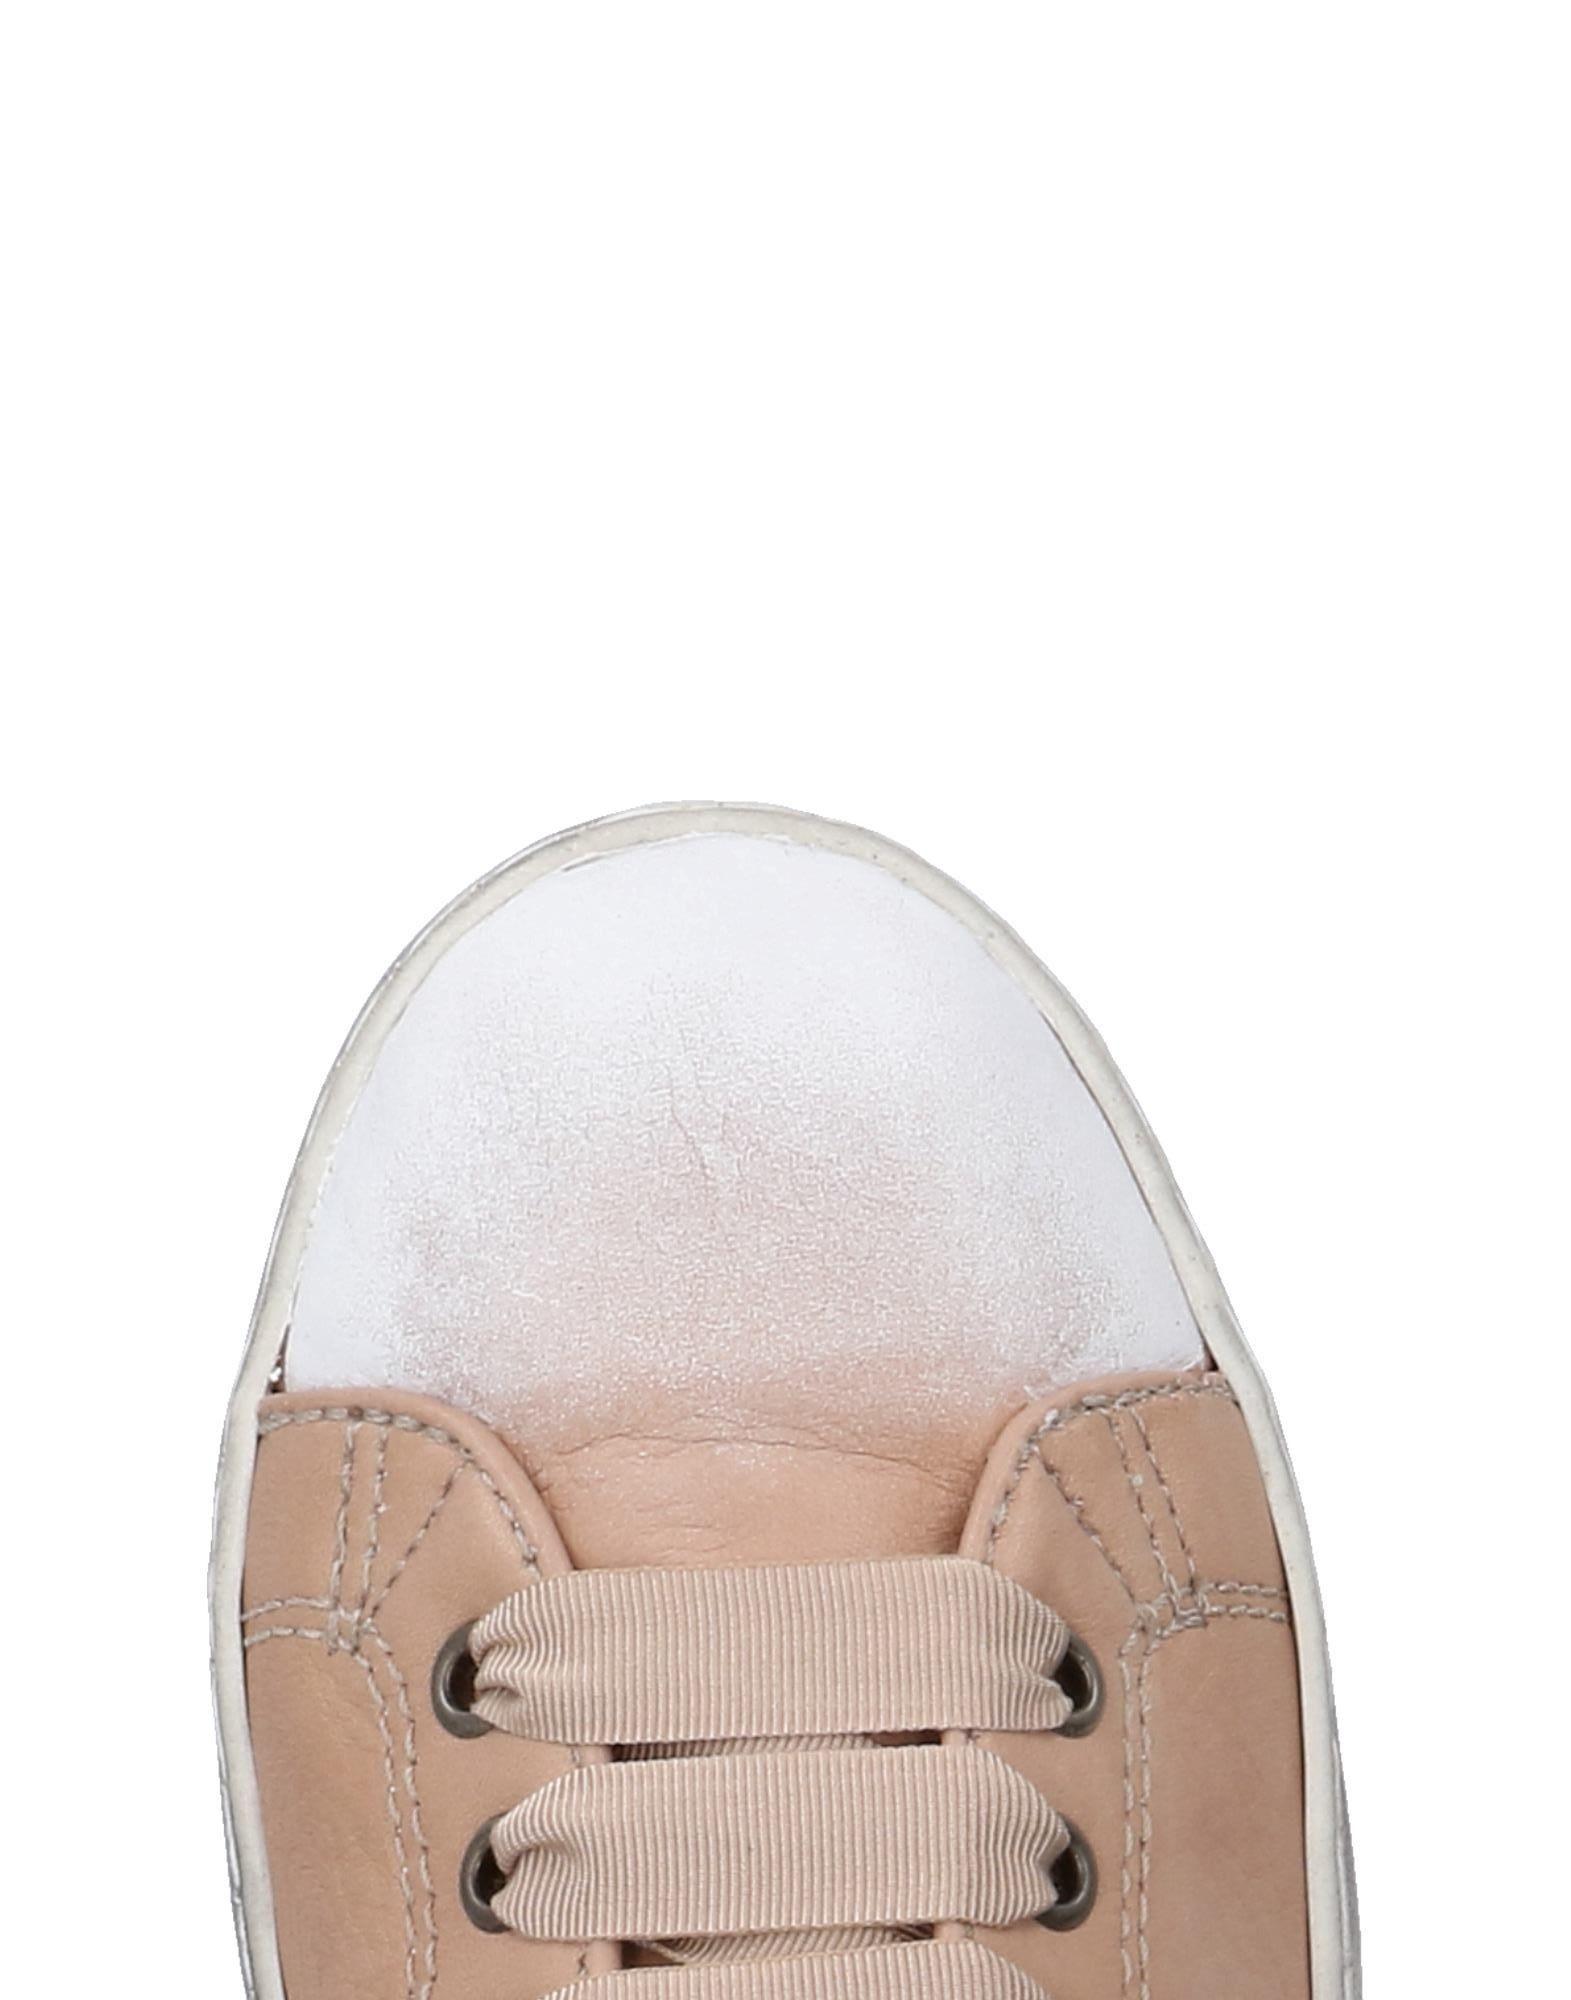 Cividini Sneakers Damen  11499328OL Gute Qualität beliebte Schuhe